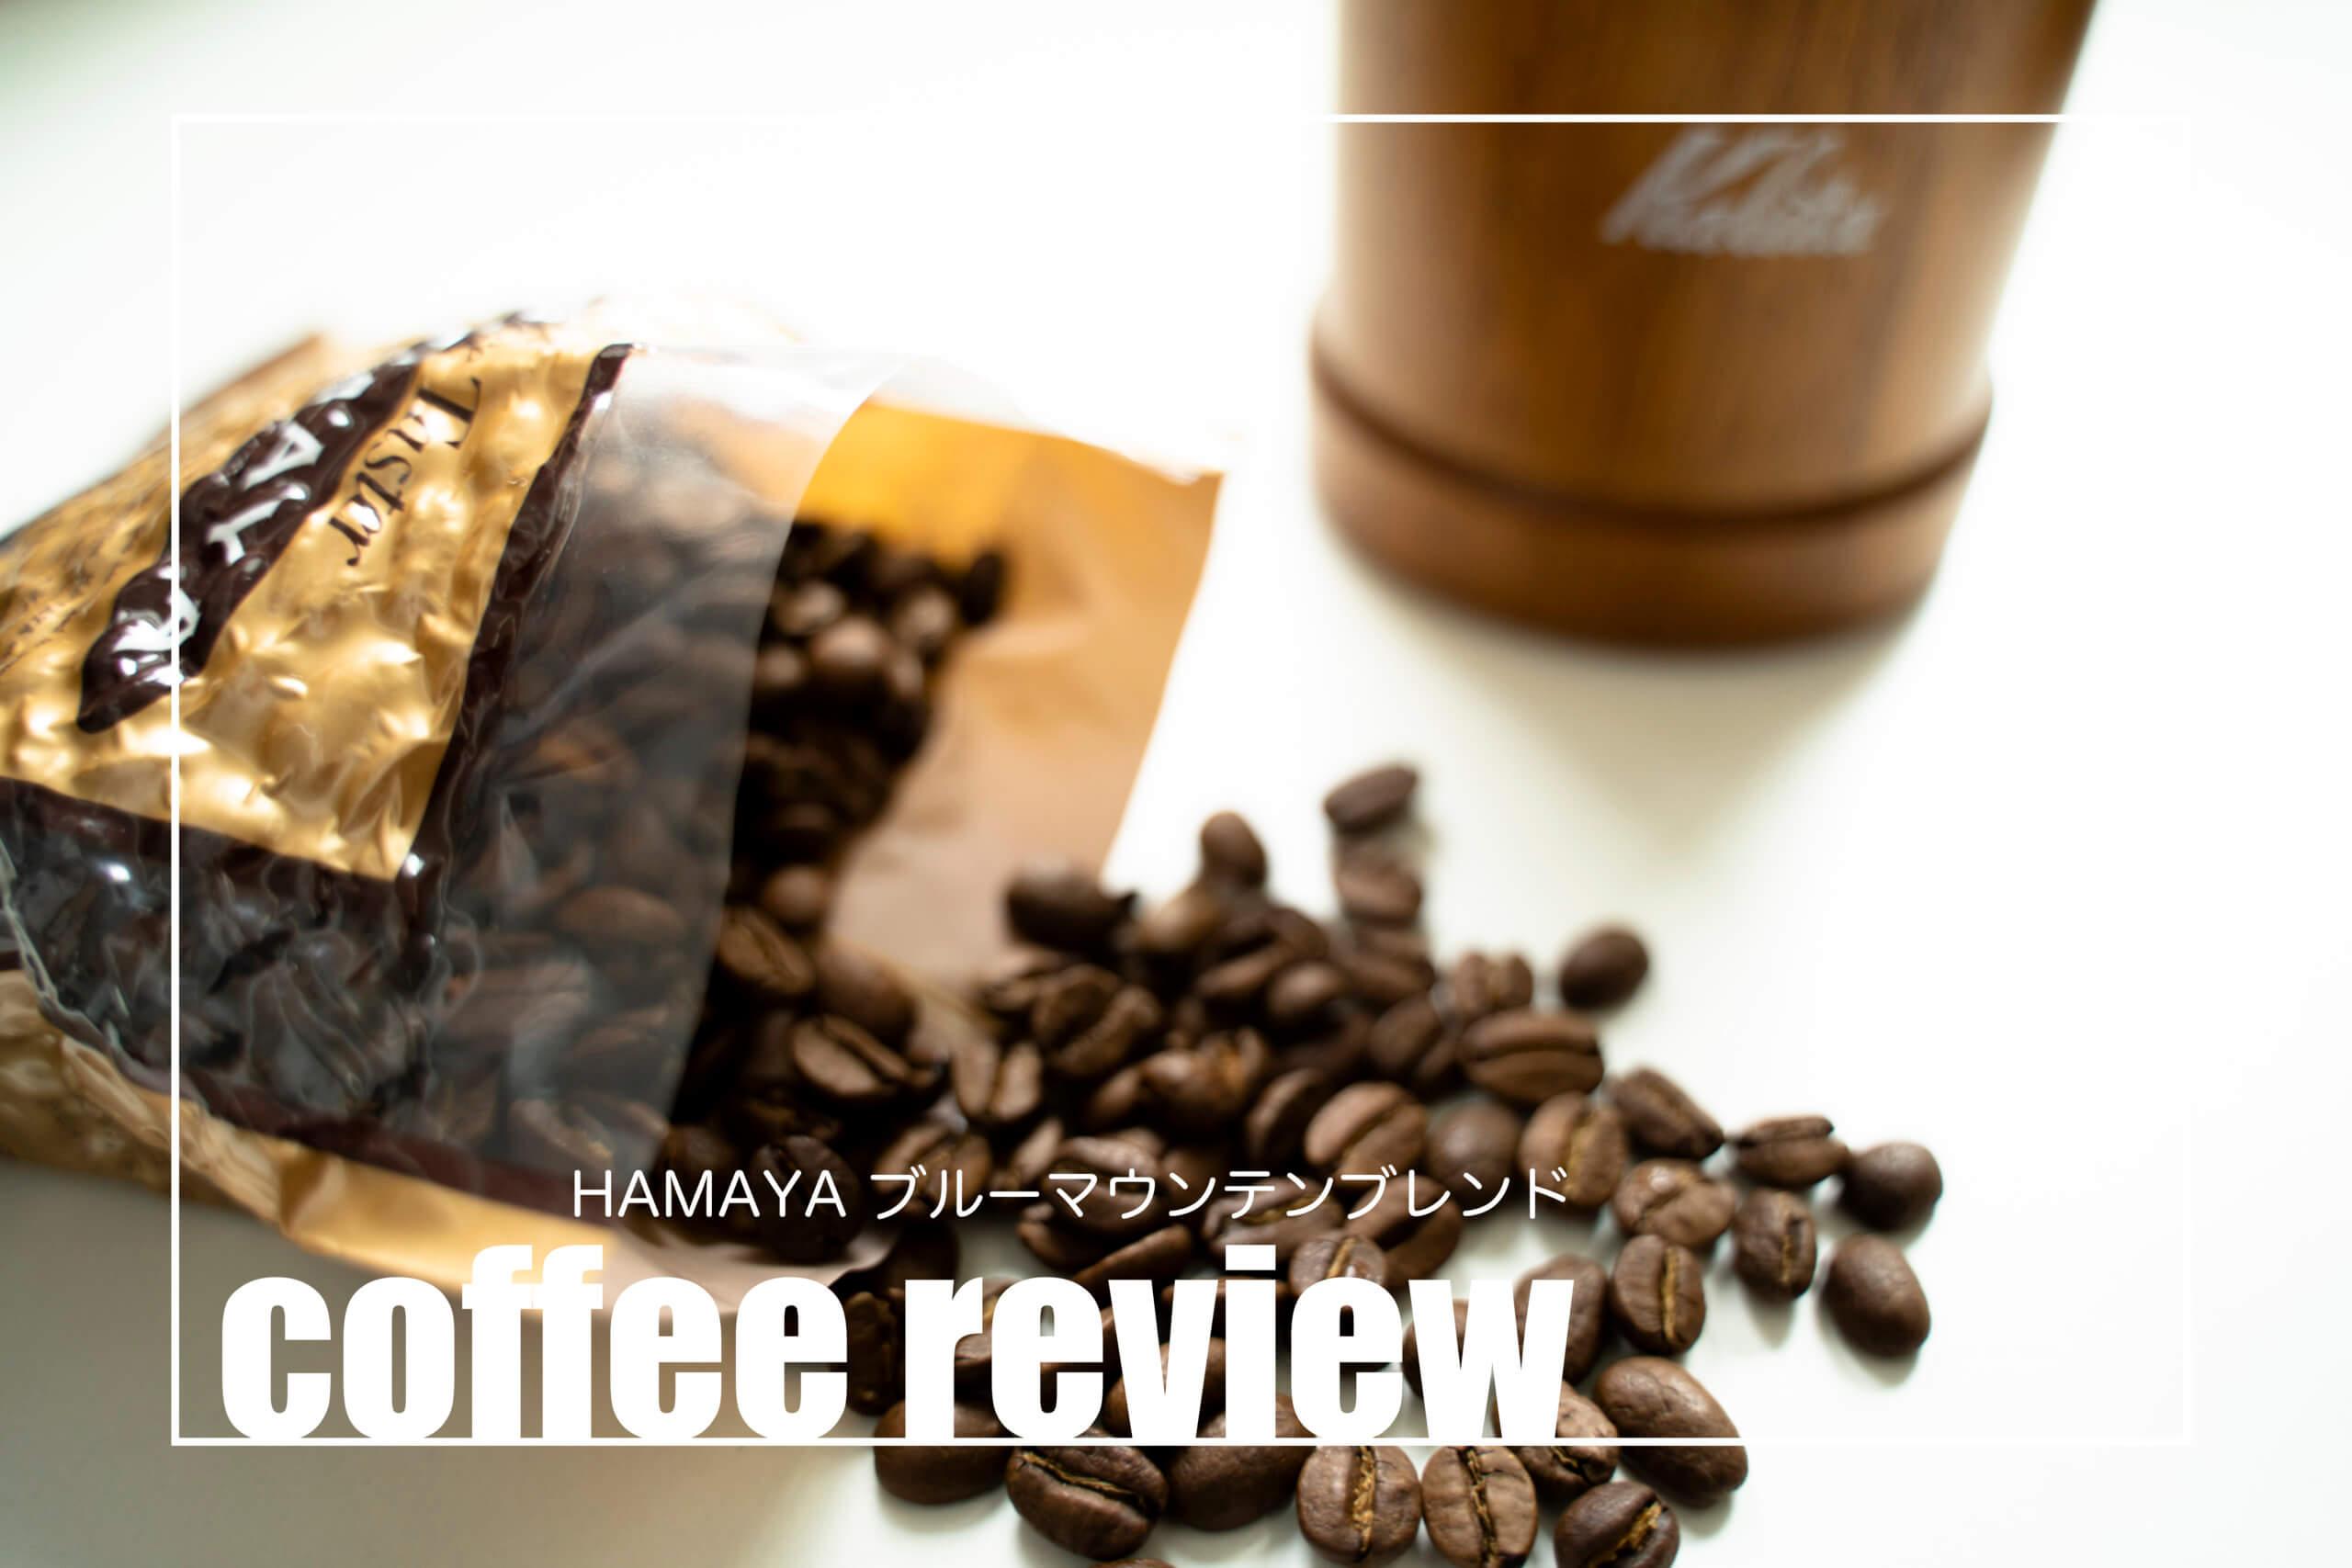 coffee review 珈琲の話《HAMAYA ブルーマウンテンブレンド》